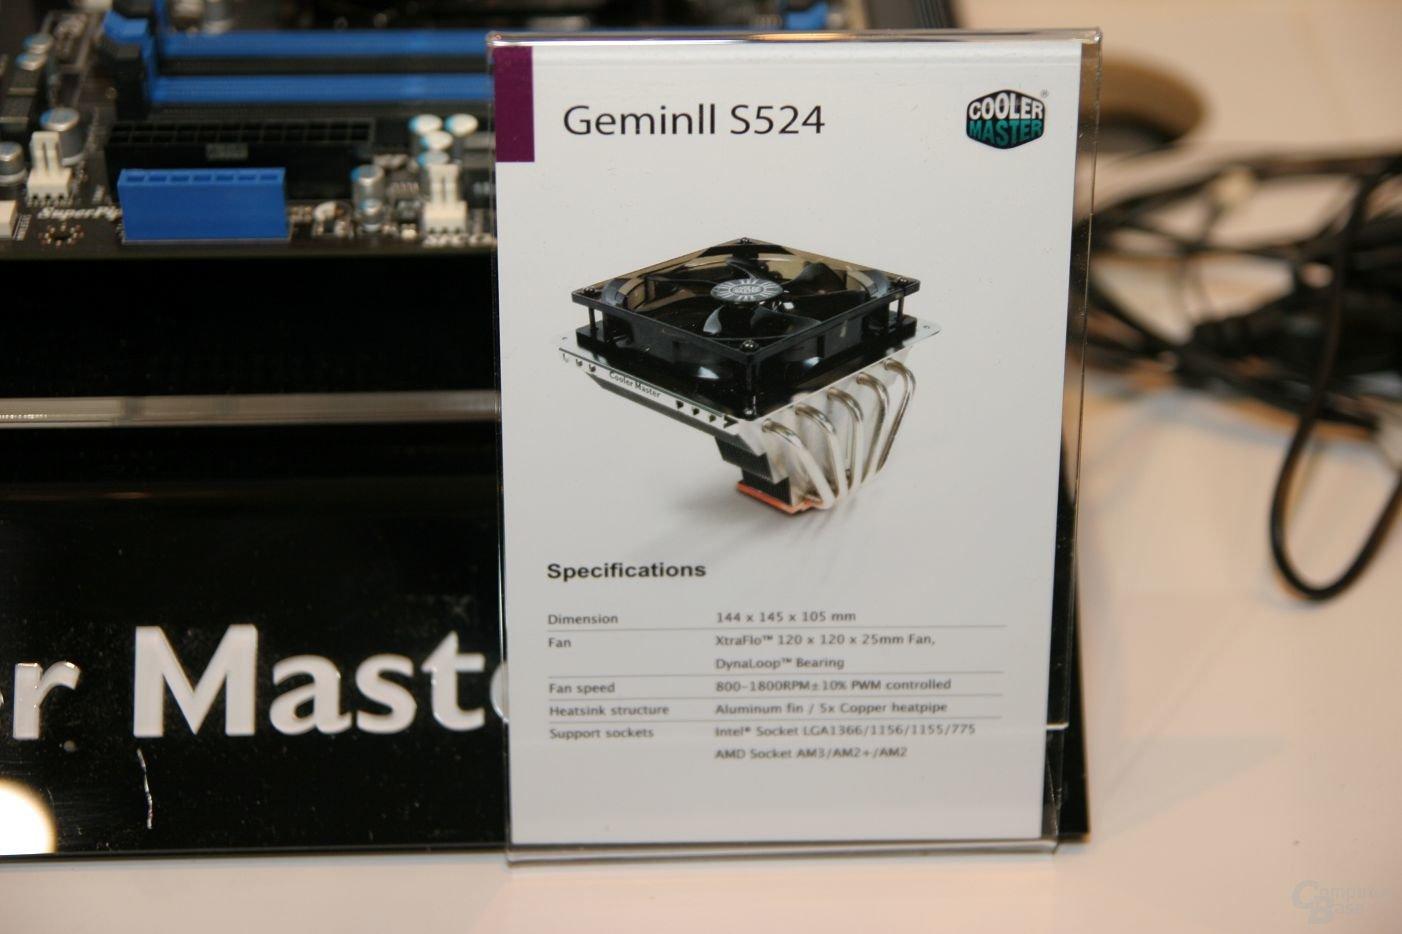 Cooler Master Gemin II S524